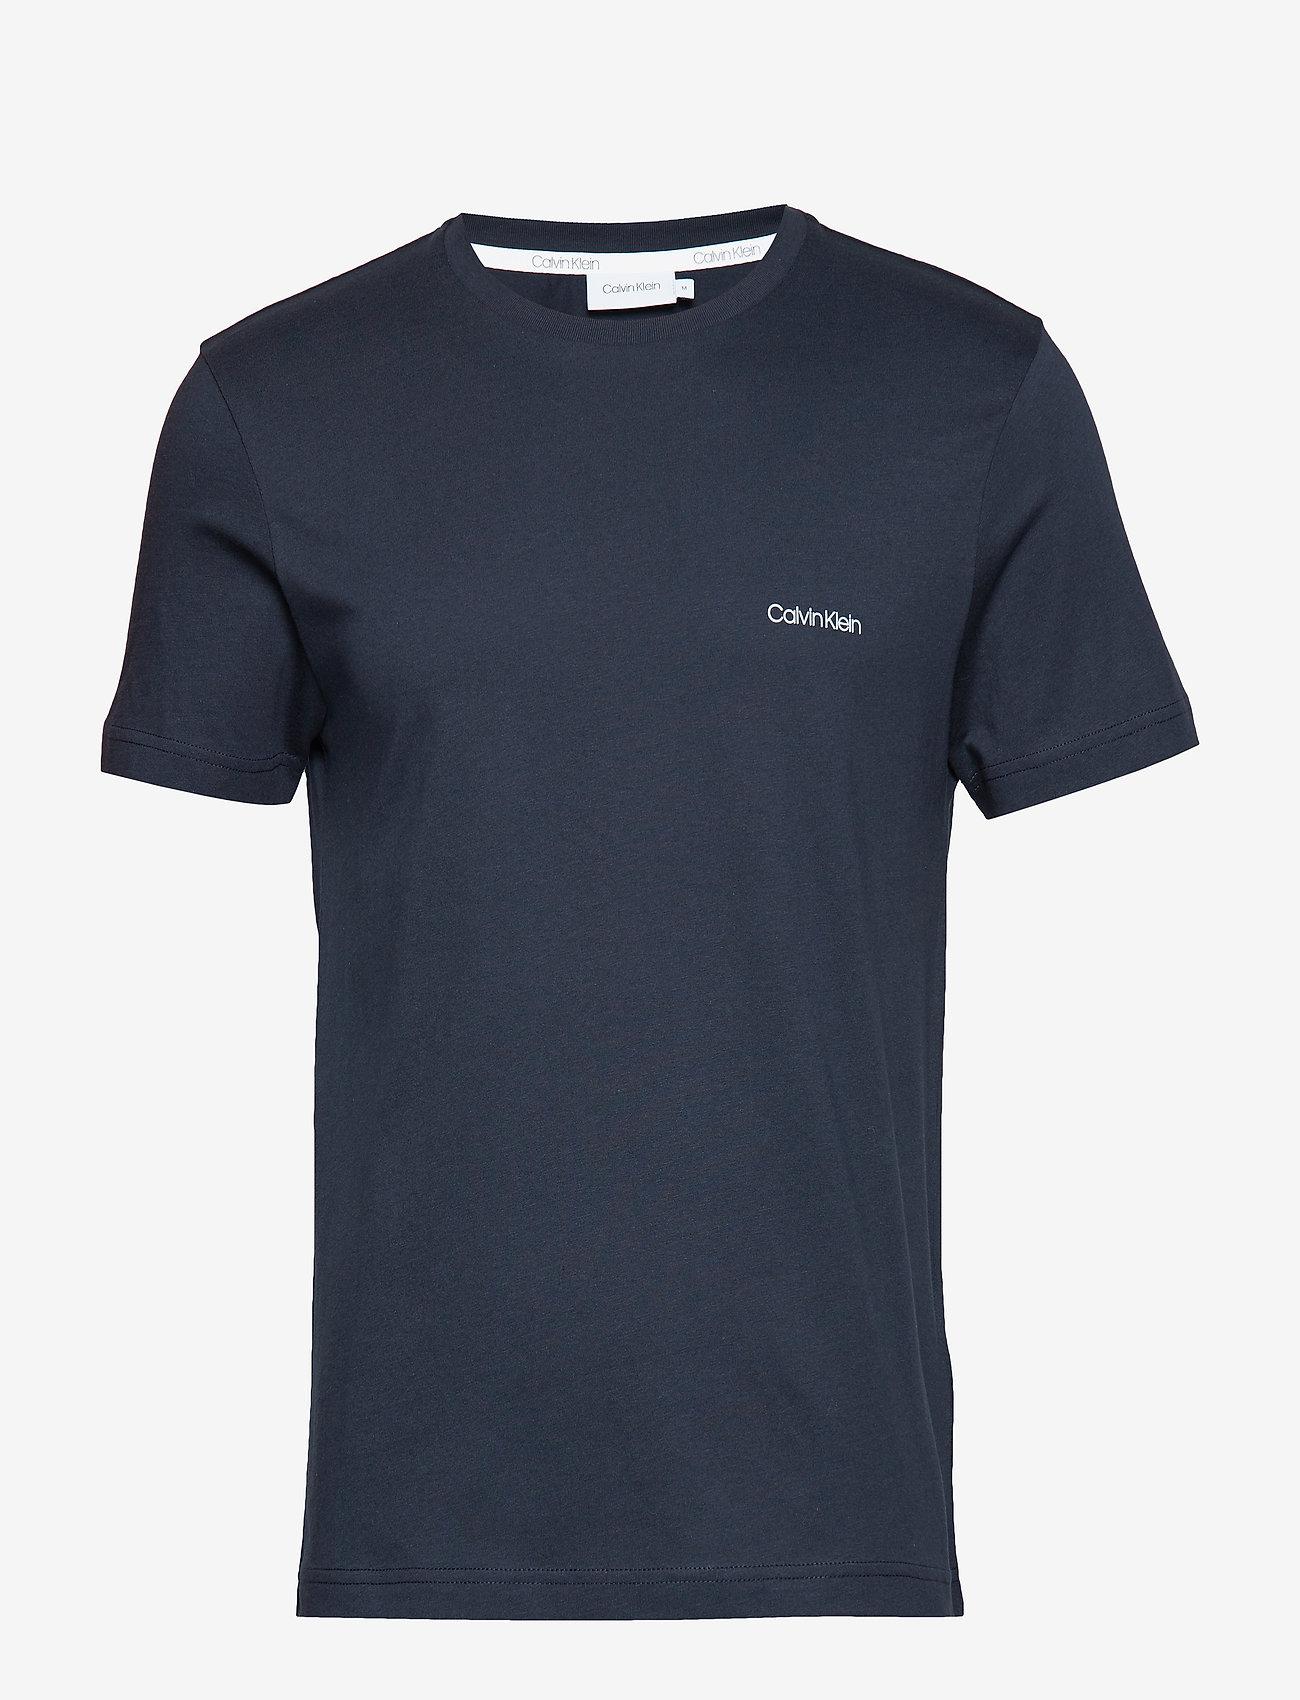 Calvin Klein - COTTON CHEST LOGO T-SHIRT - basic t-shirts - calvin navy - 0